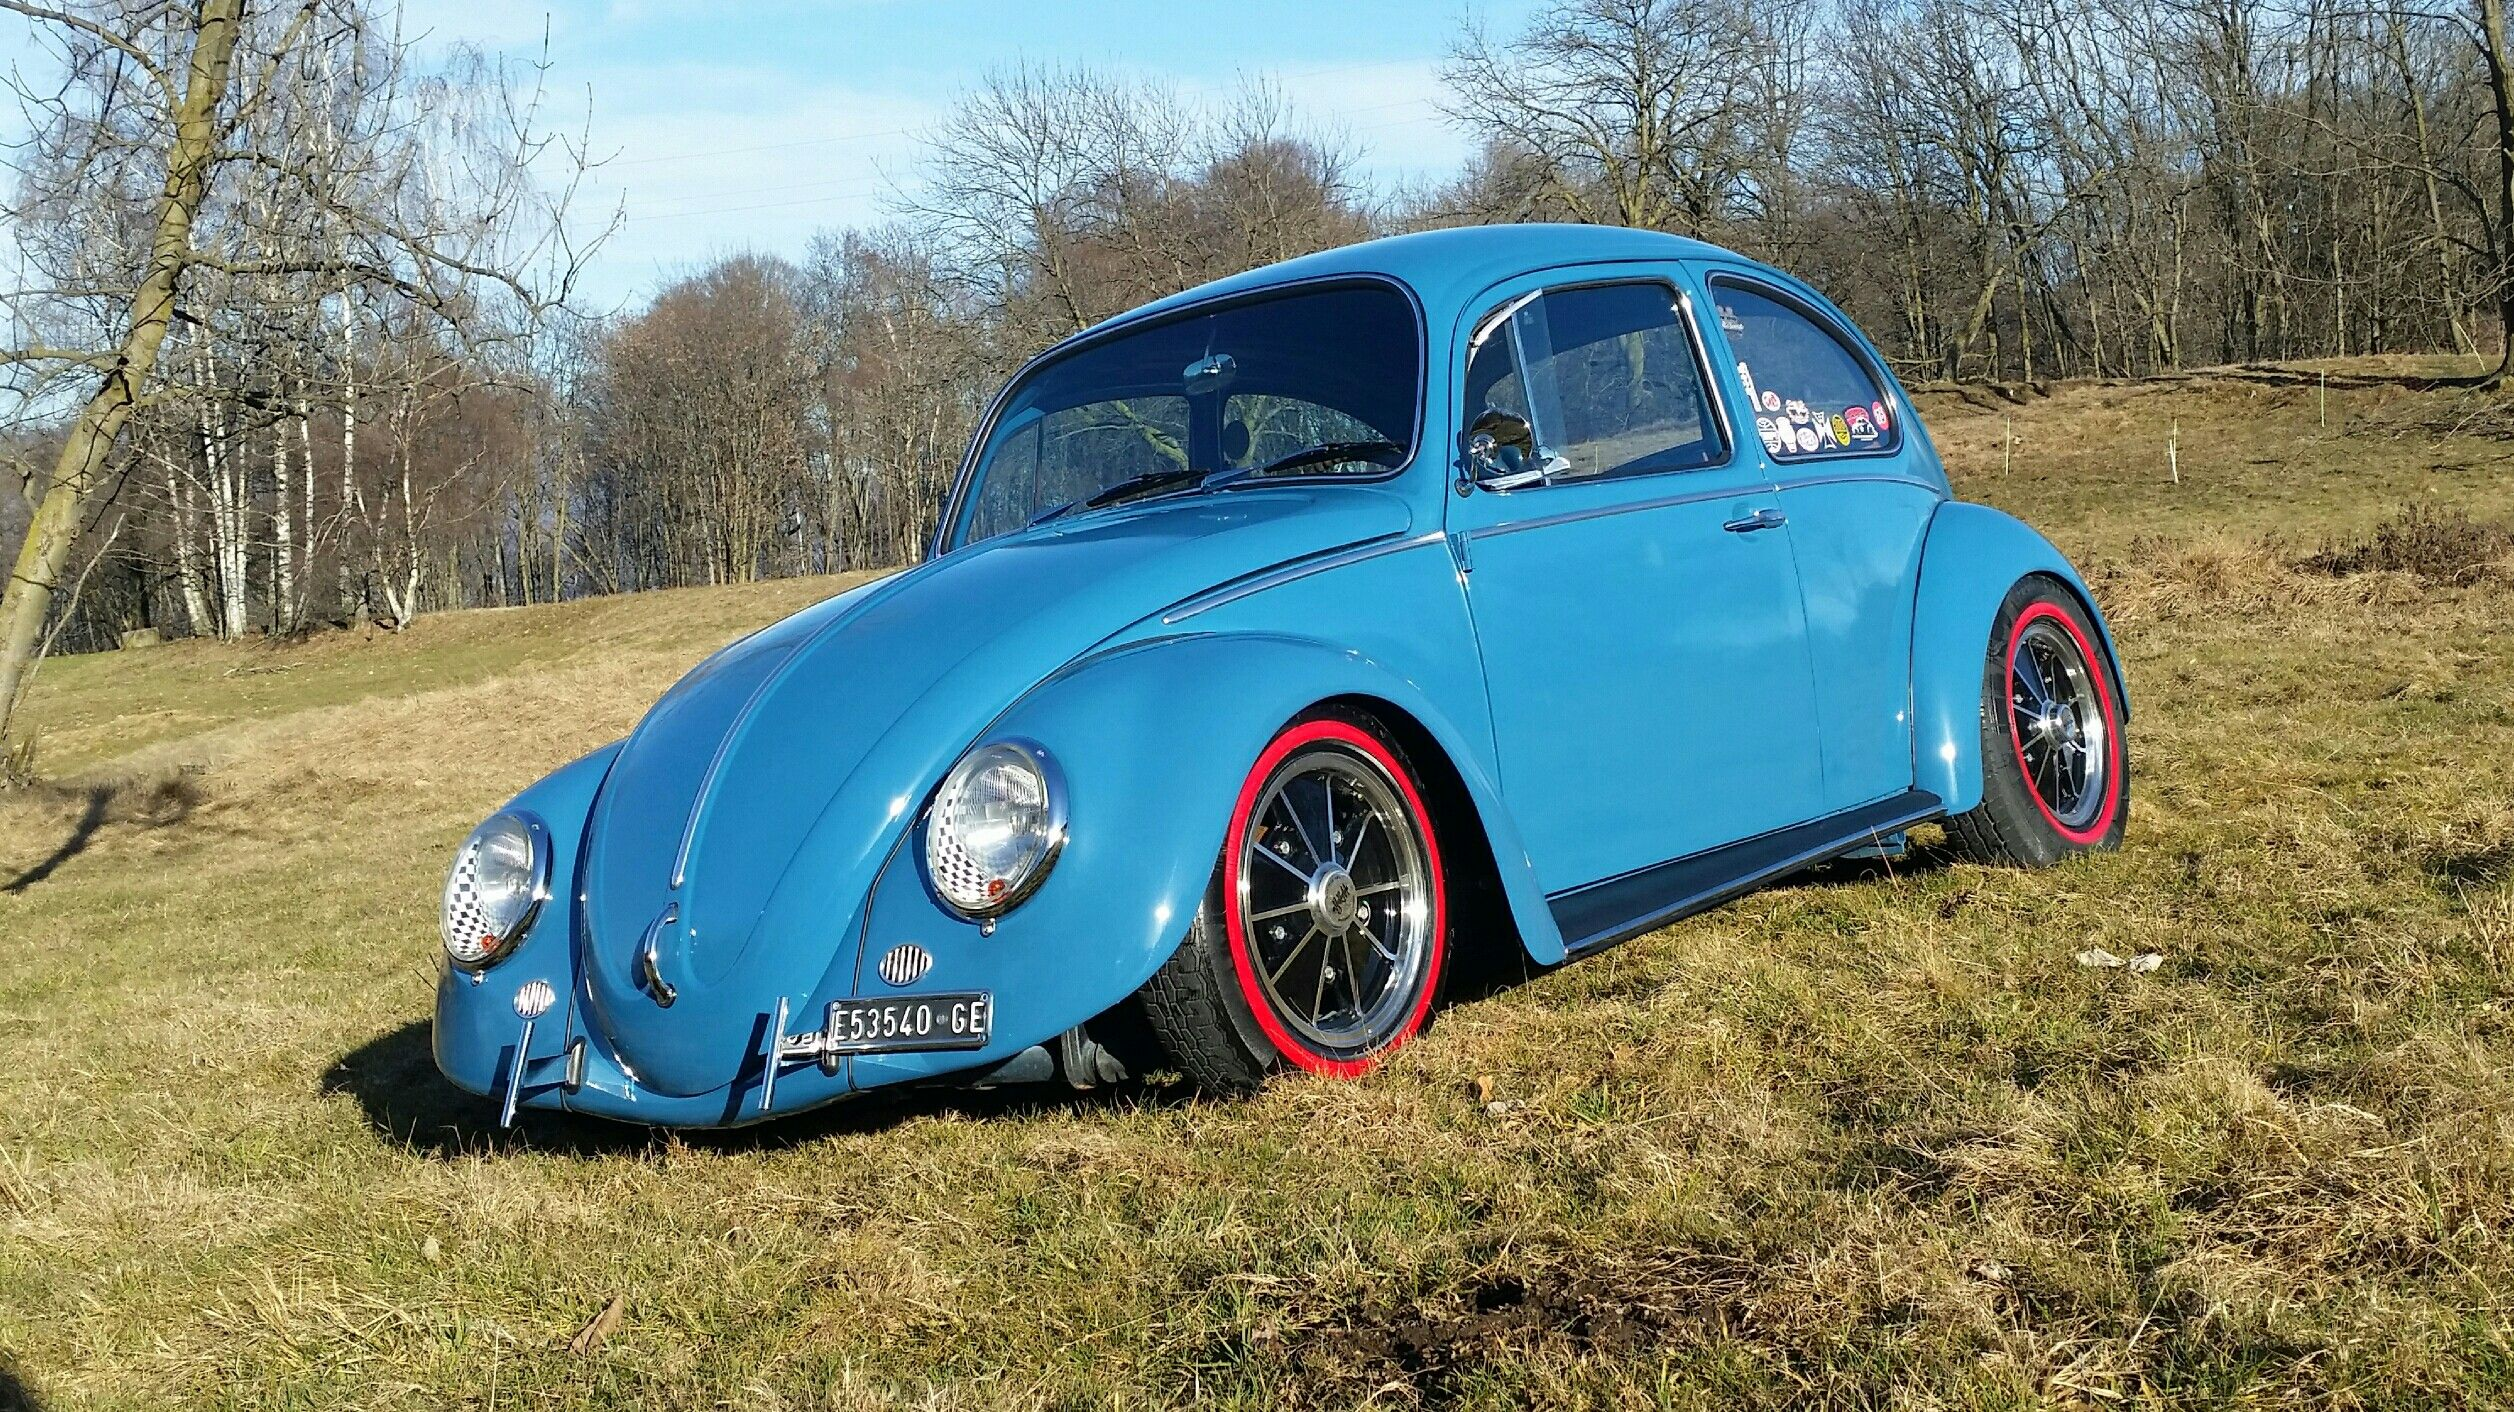 vw beetle bug coccinelle maggiolino cal look vintage cool blue vintage racing [ 2514 x 1412 Pixel ]